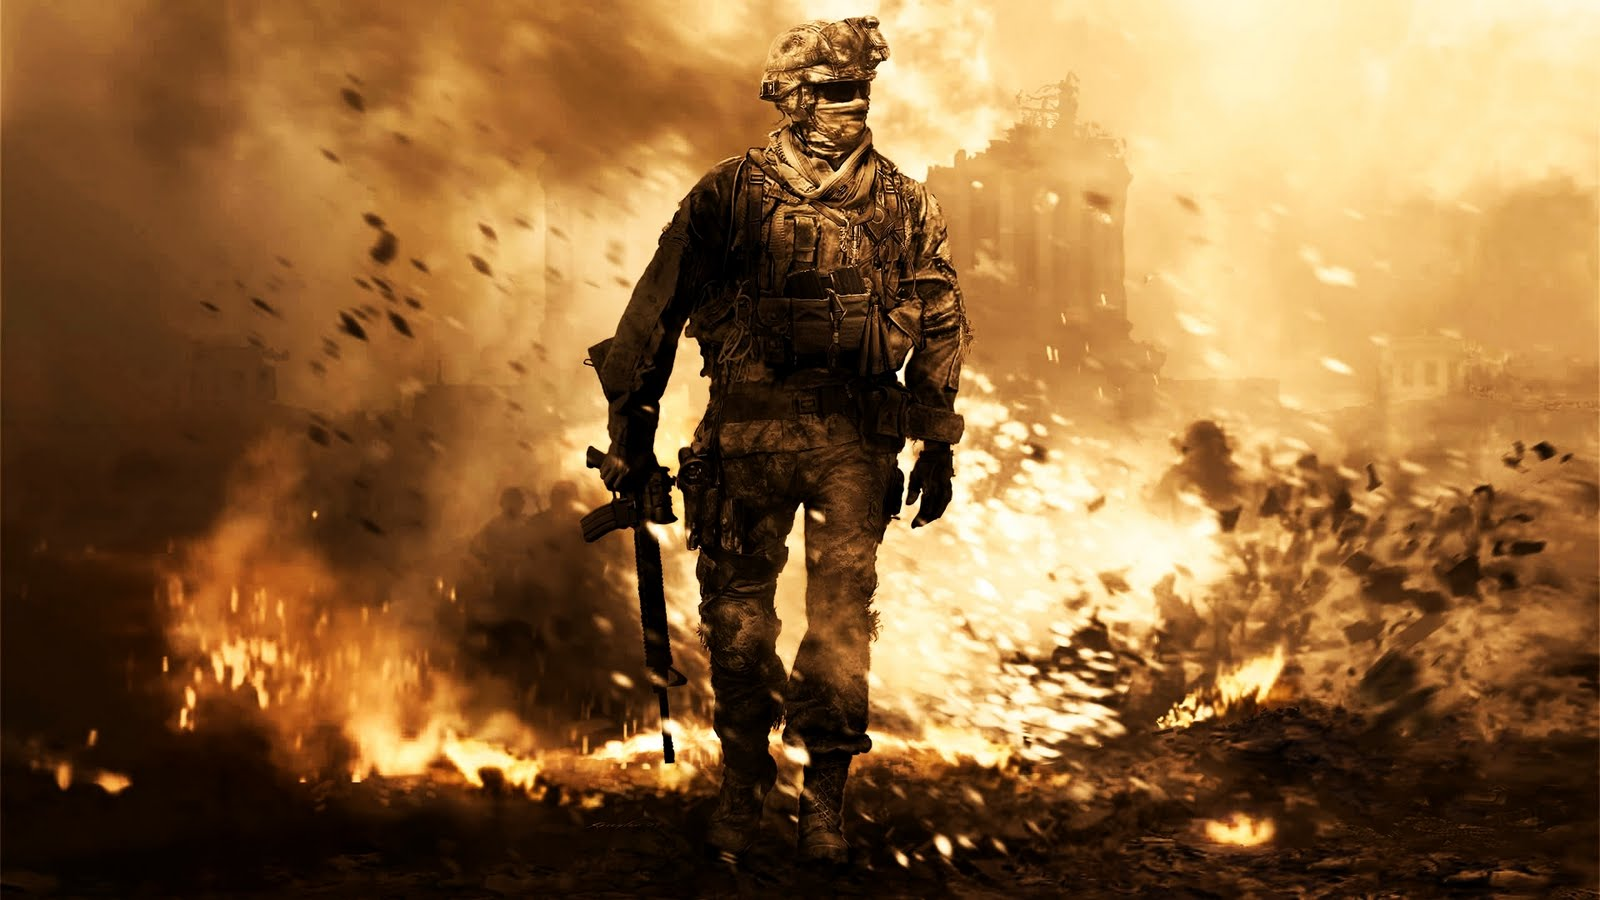 http://2.bp.blogspot.com/-XgRyU8mdxSw/UTQU-BBqsWI/AAAAAAAAAB8/U77b9y4o3Ag/s1600/Modern_Warfare_2_hd+special+wallpaper.jpg